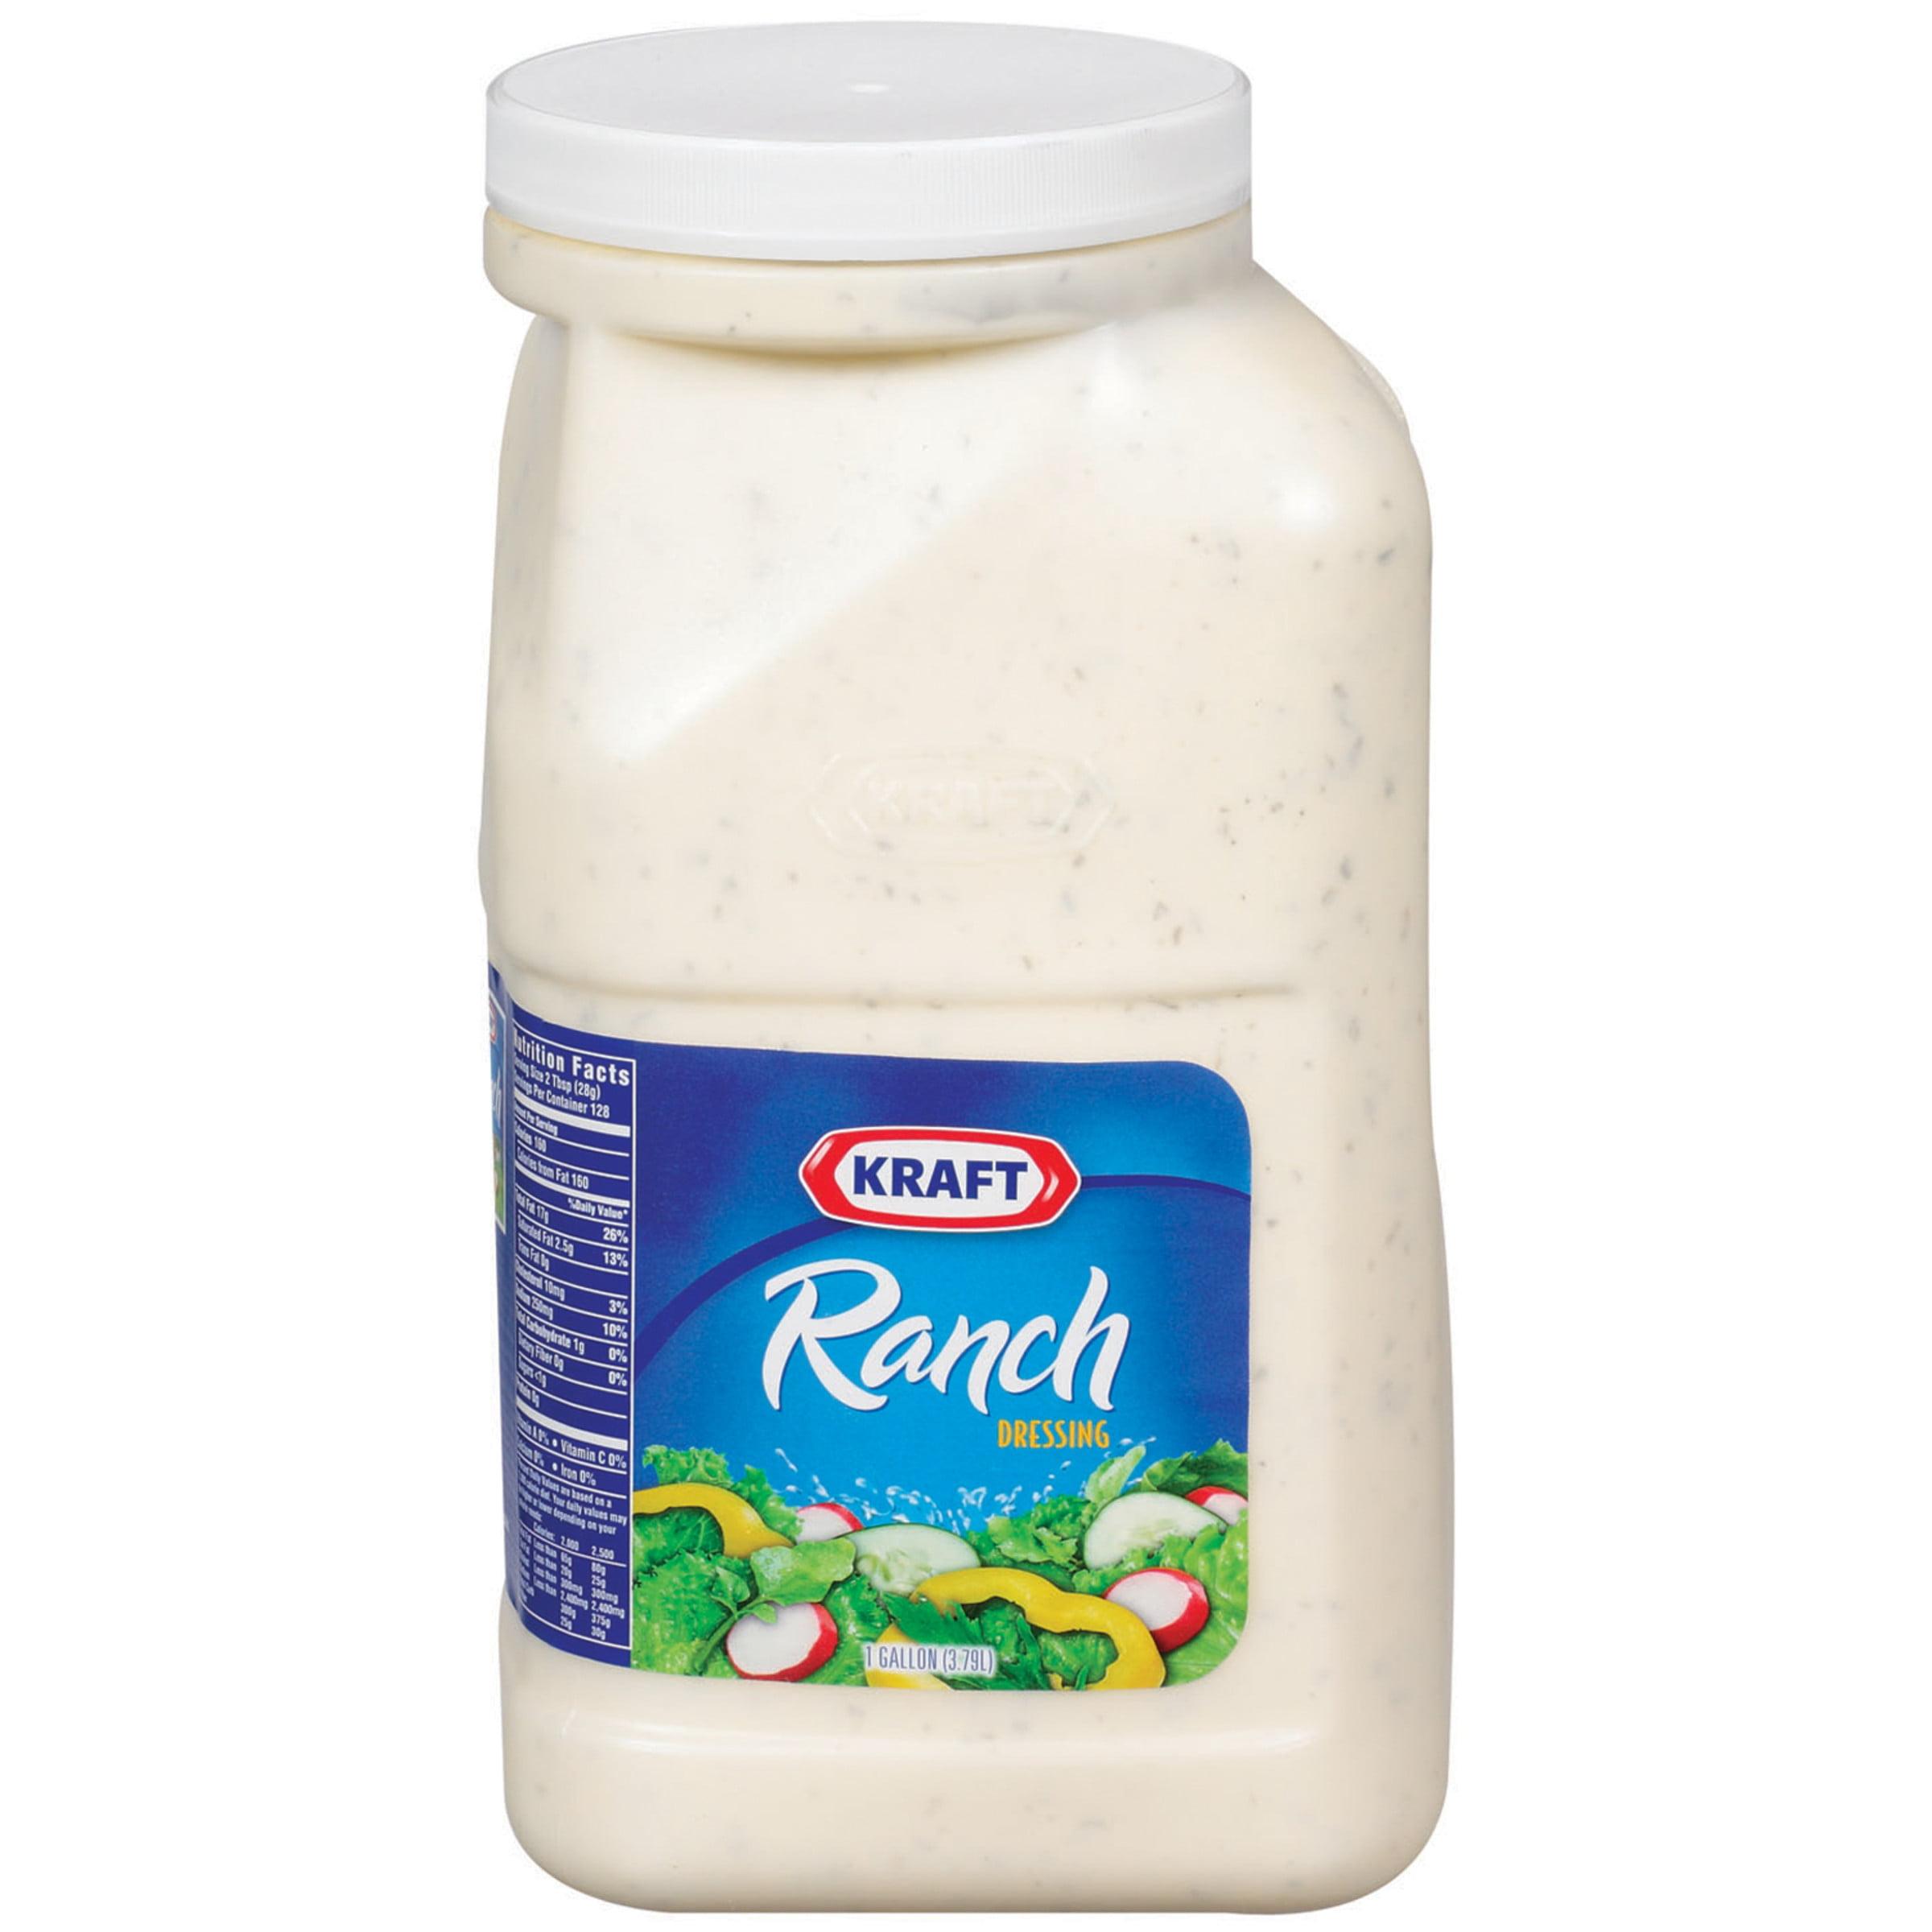 Kraft Ranch Salad Dressing, 1 gal Jug